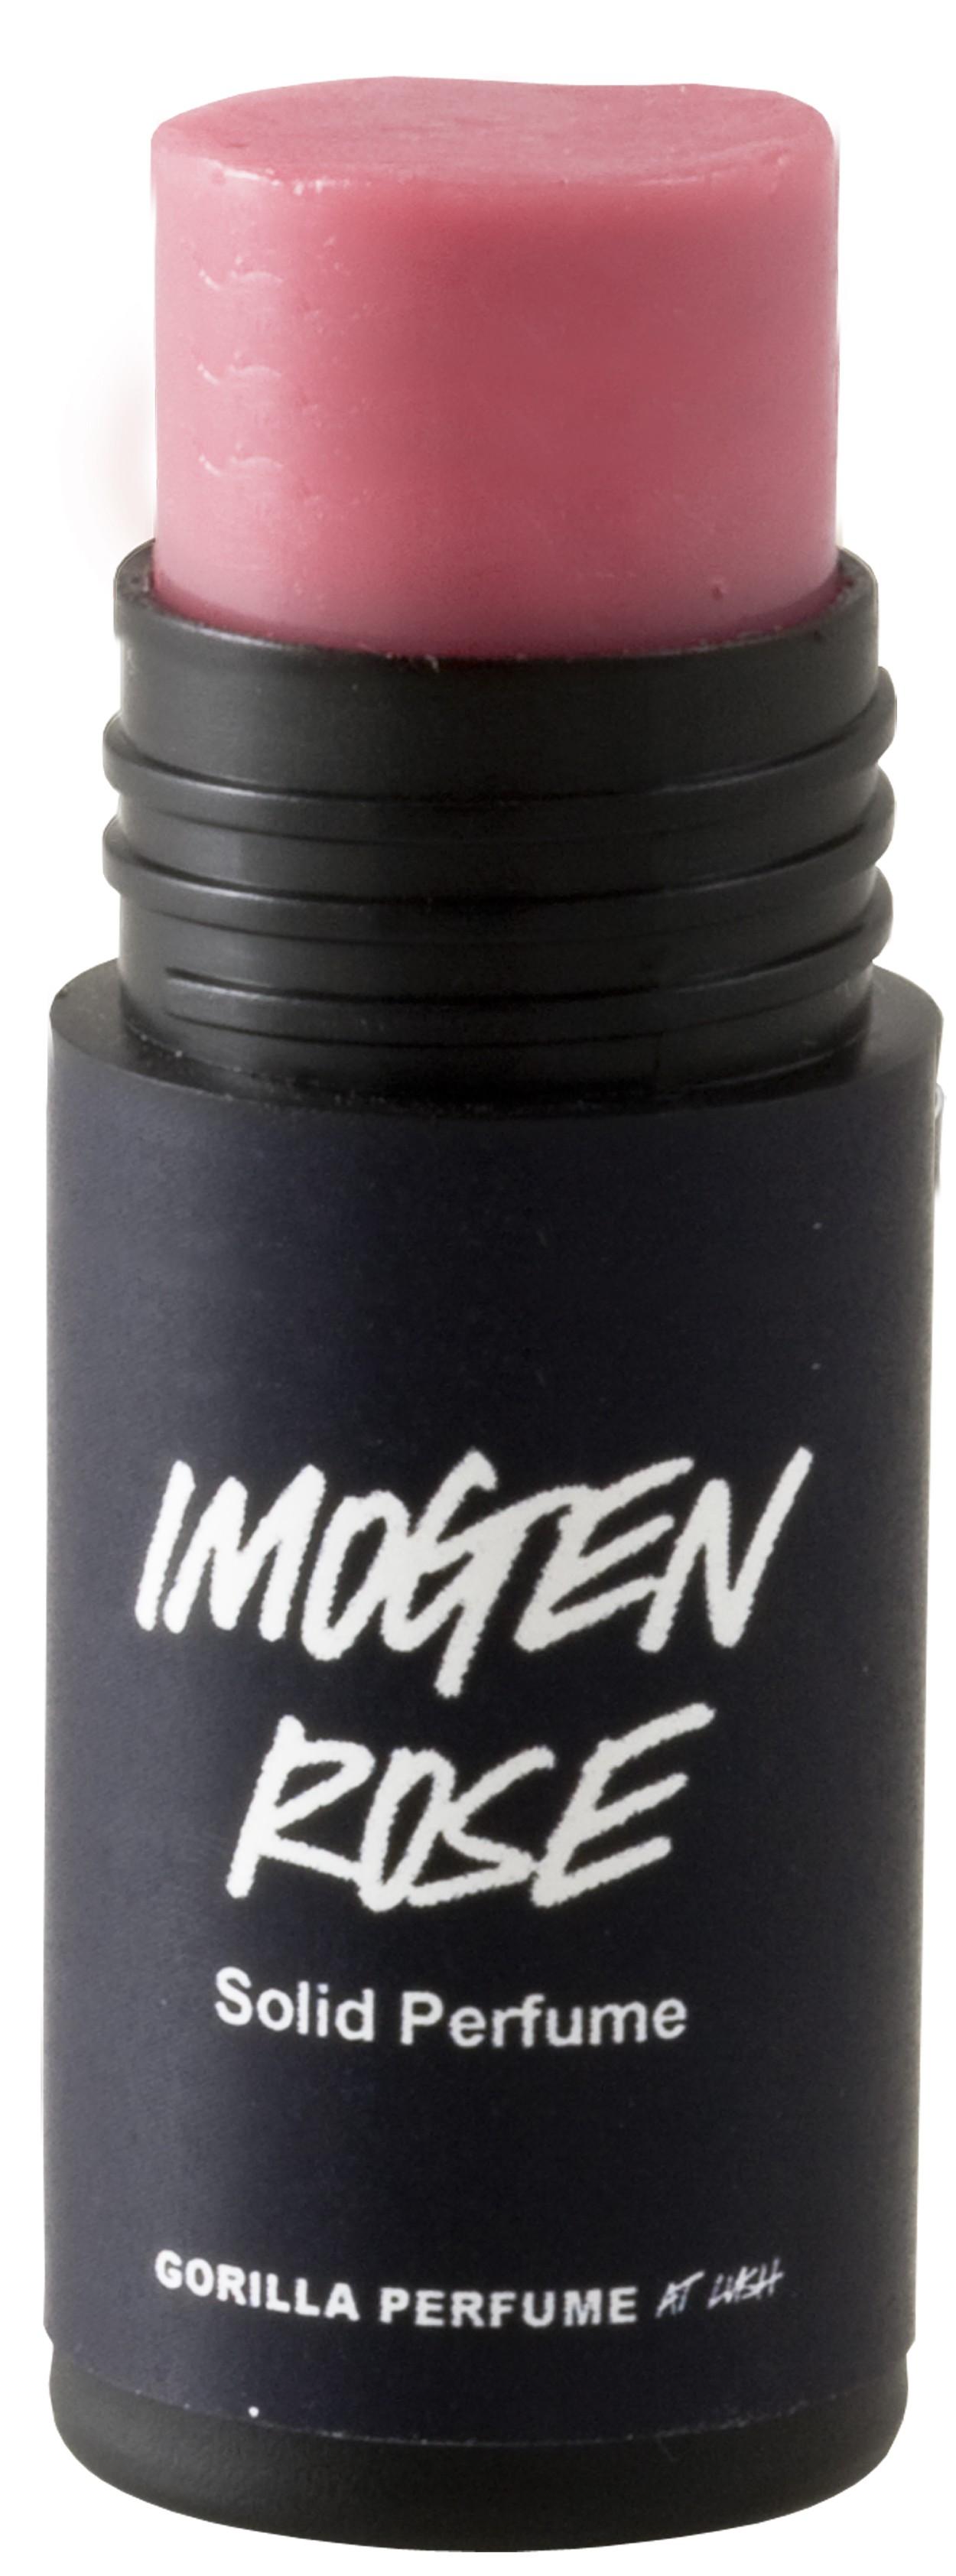 Lush Imogen Rose аромат для женщин